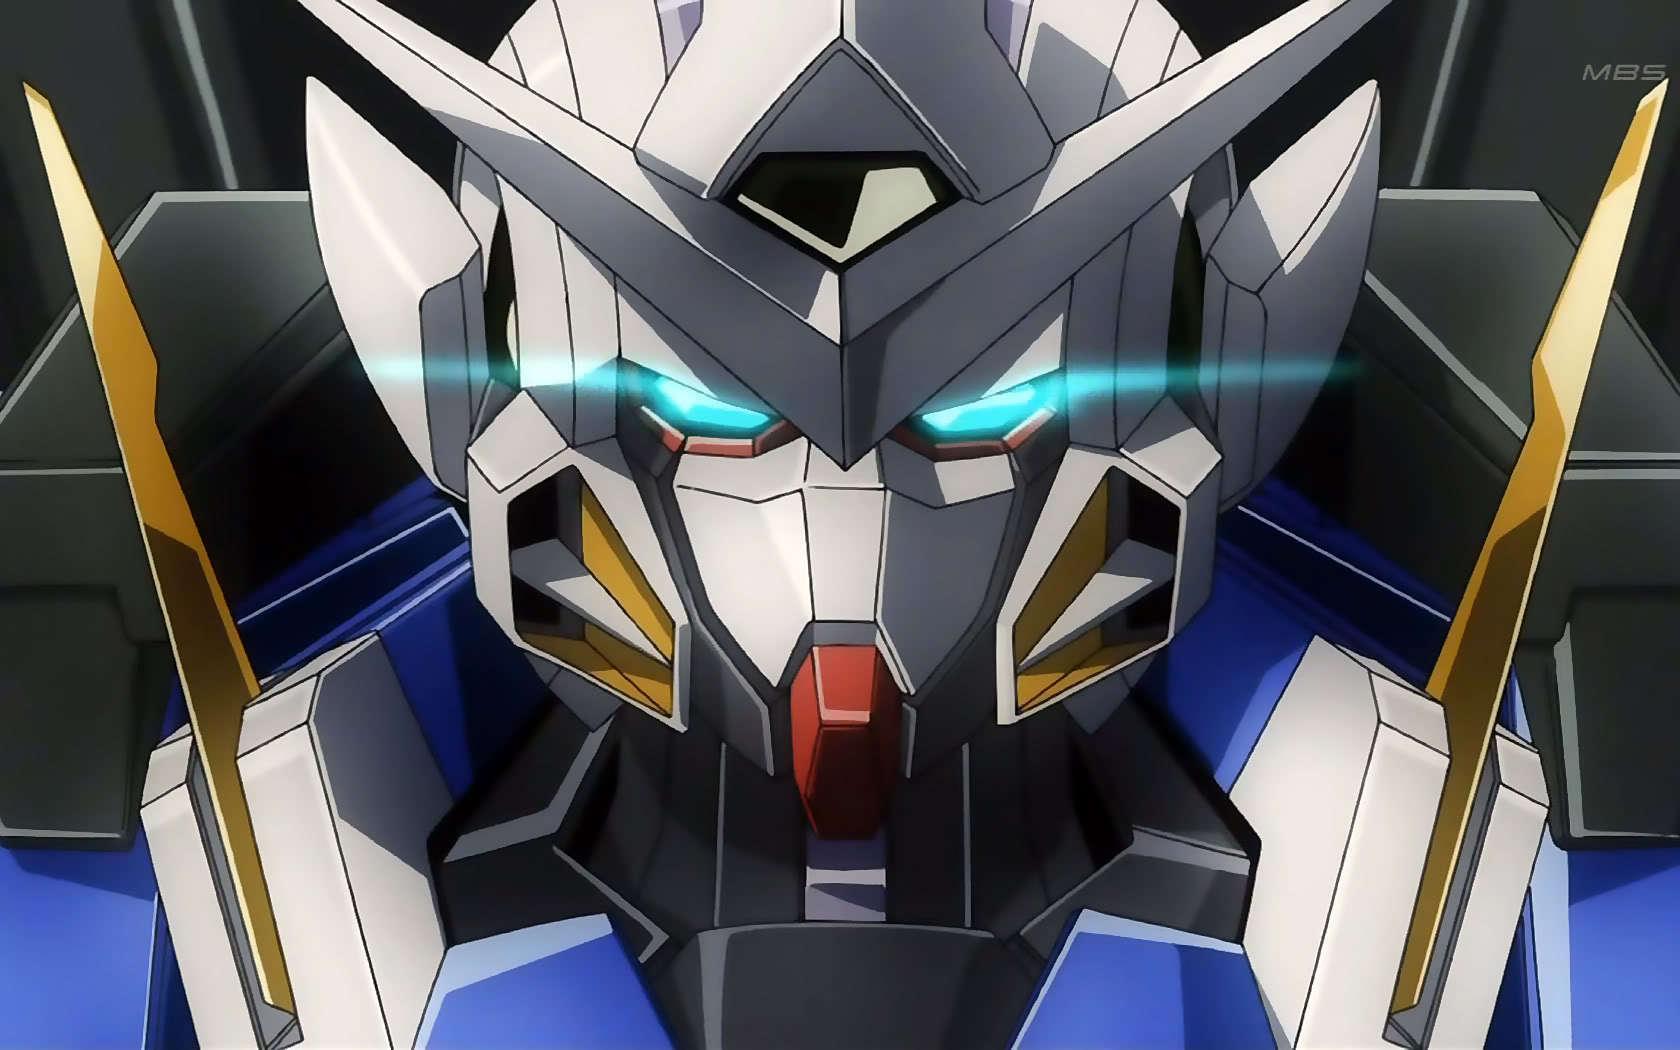 Free Download Mobile Suit Gundam 00 Images Gundam 00 Wallpaper